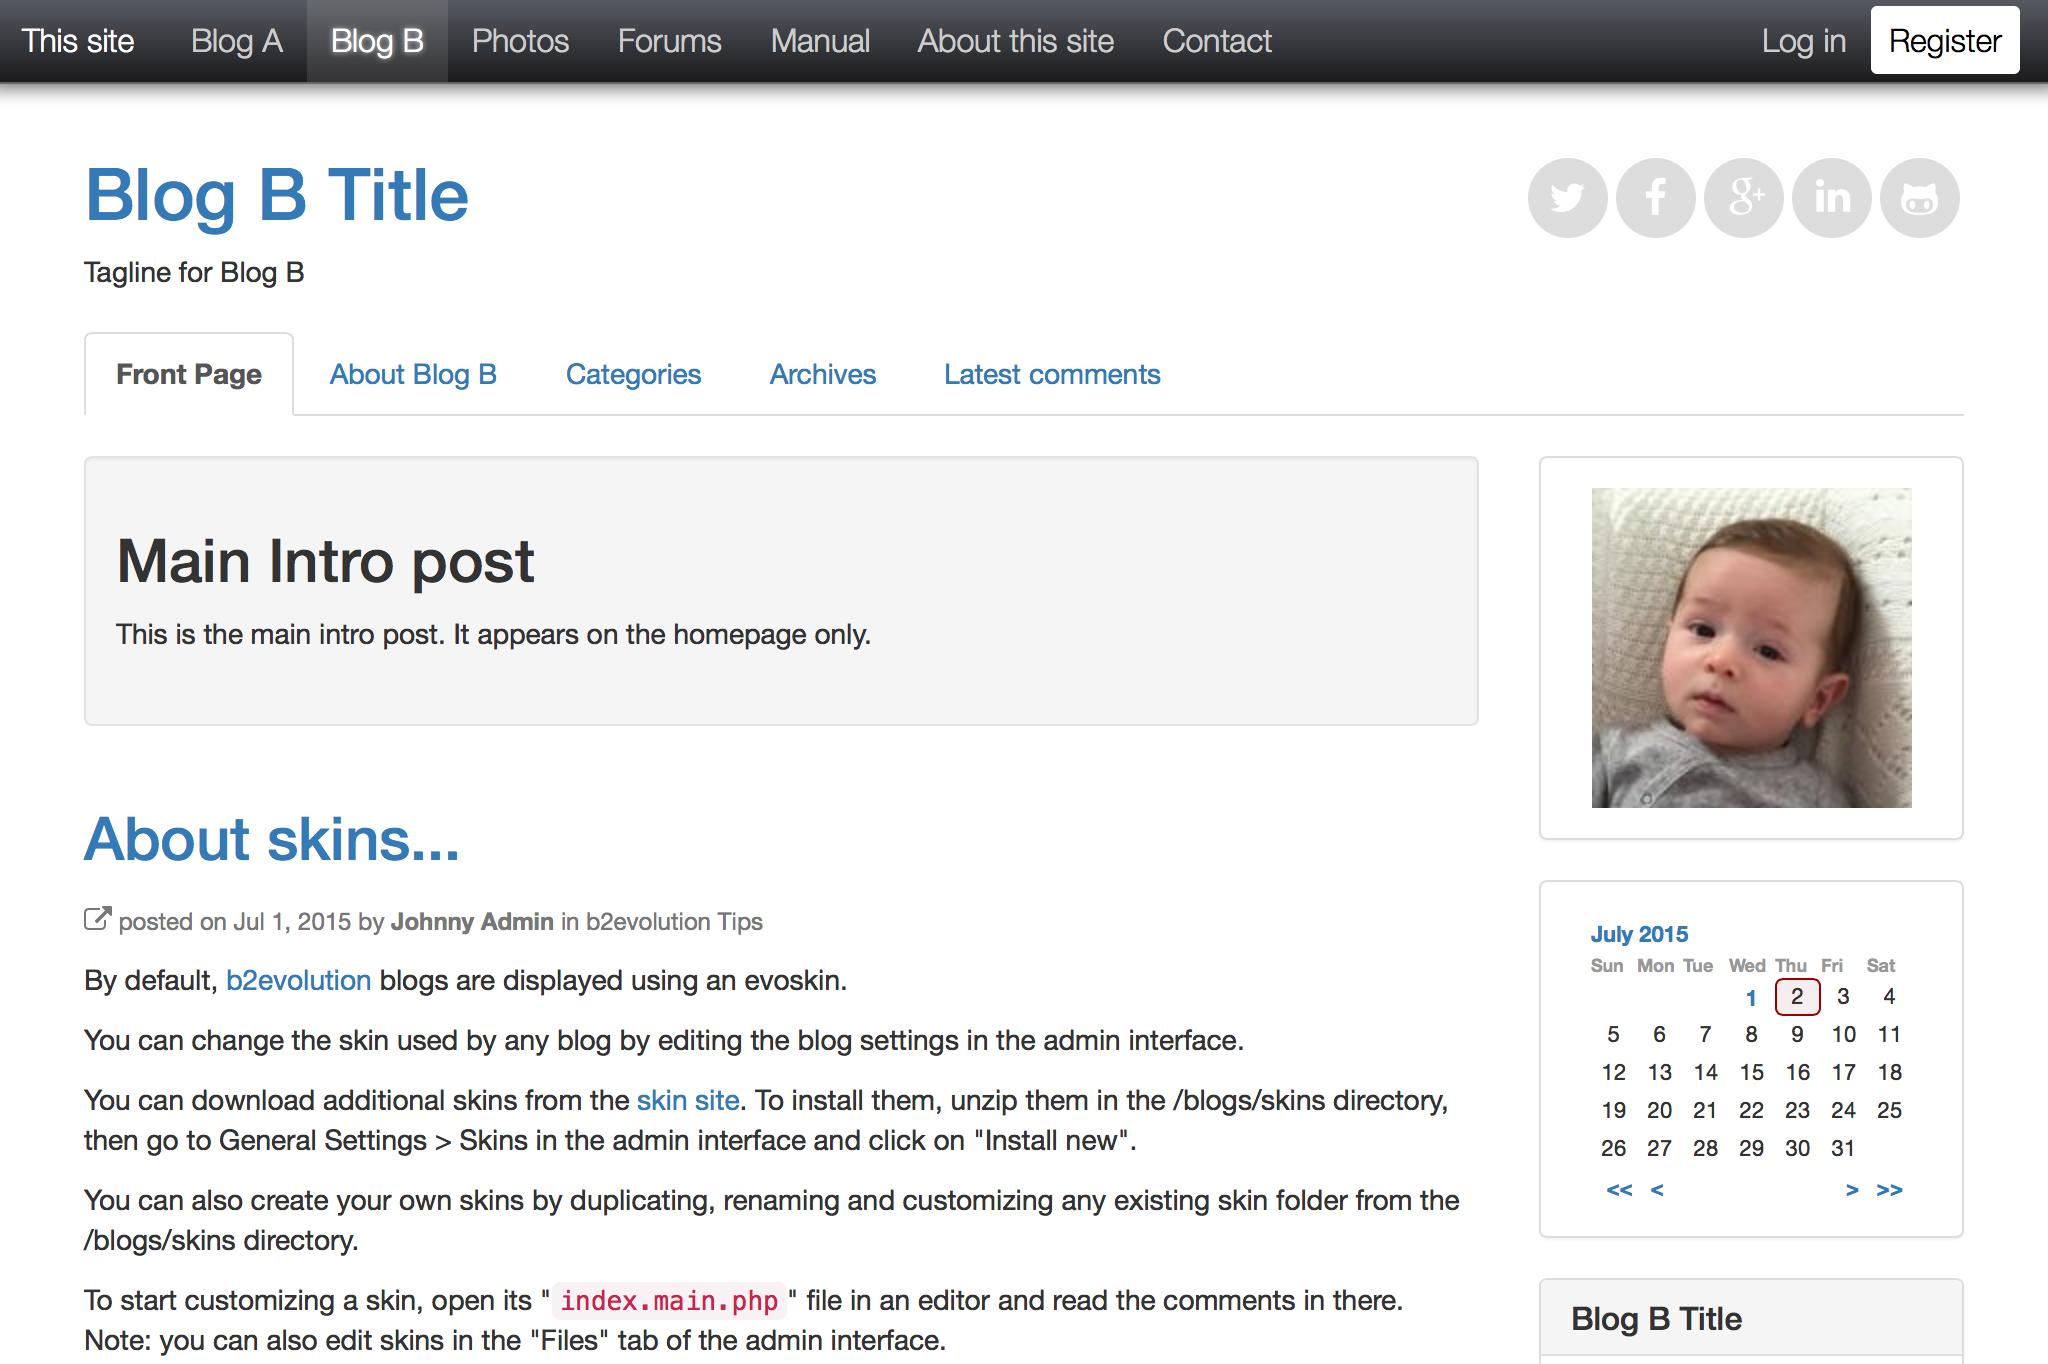 b2evolution blog/social CMS - A complete engine for your website!